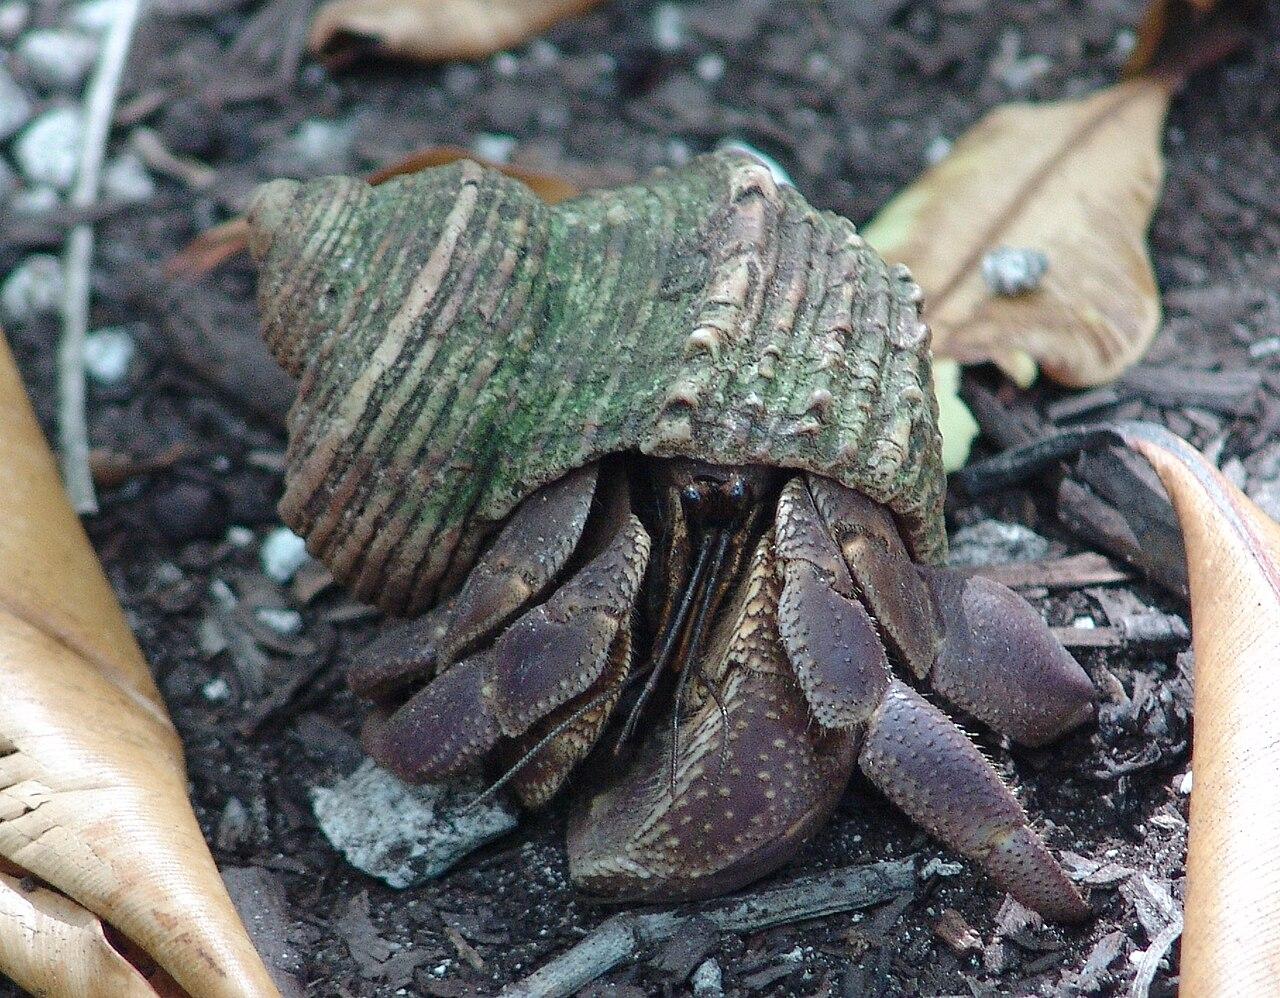 attēlscoconut crab birgus latro 4090669383jpg